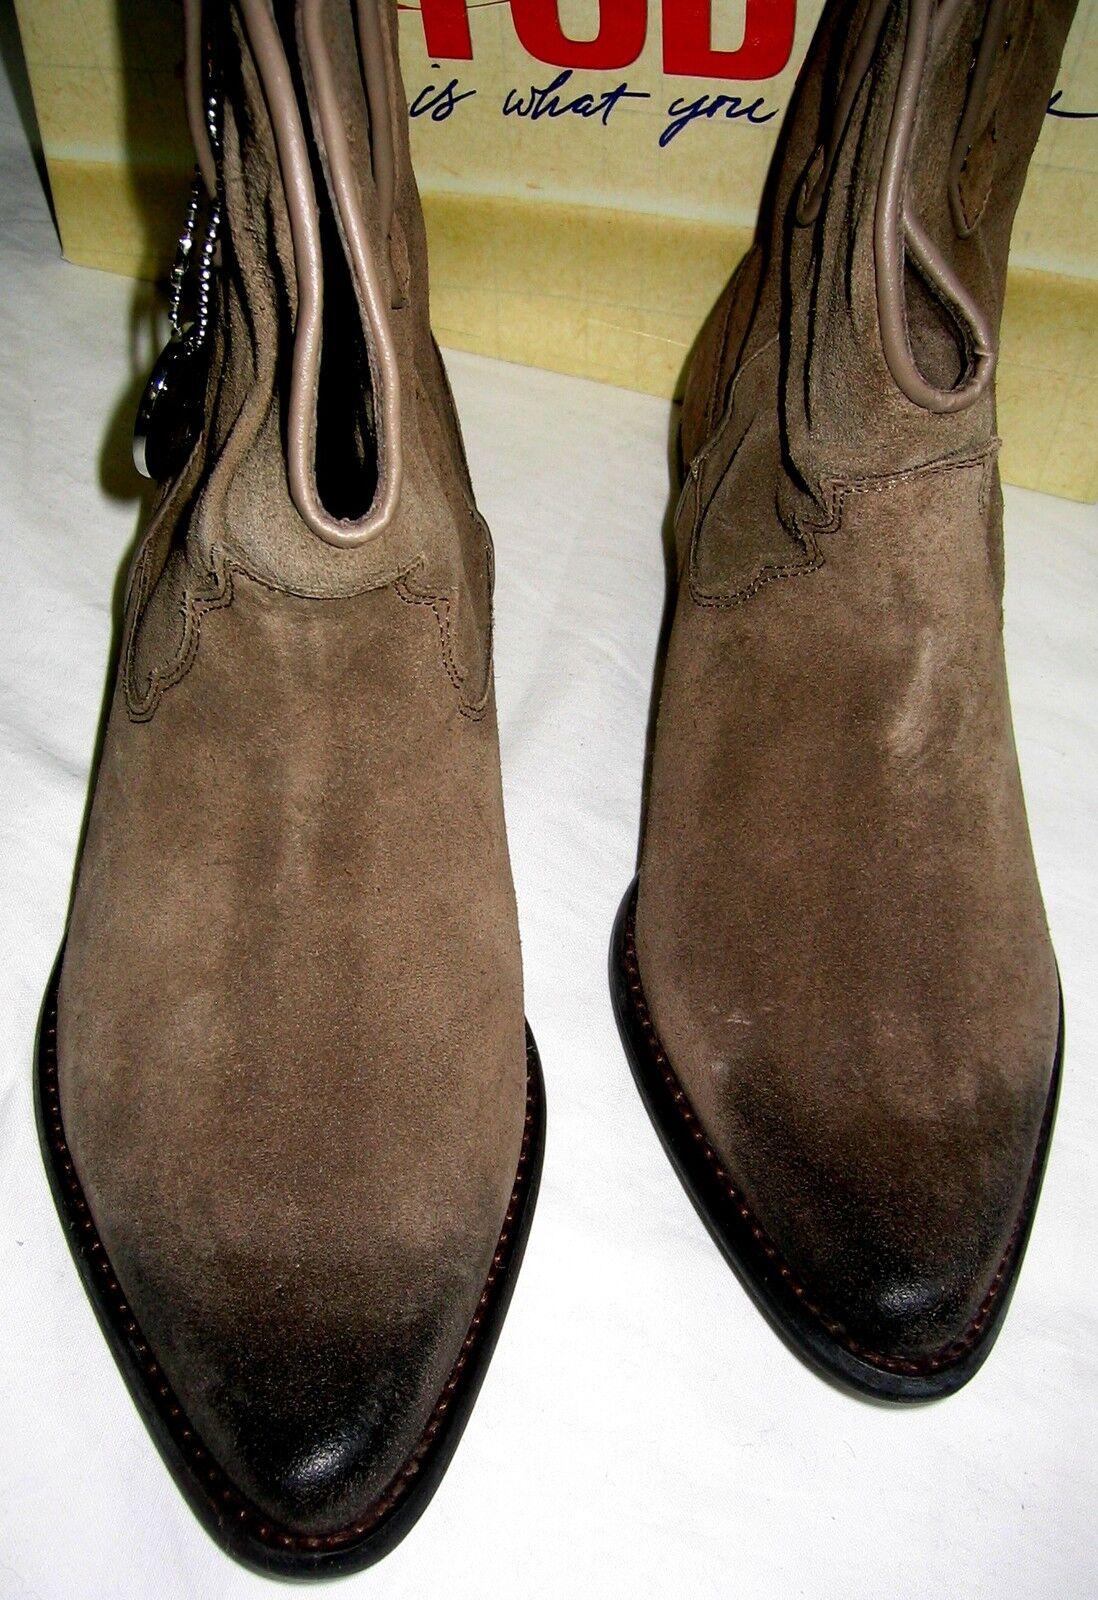 Trendy  BRONX / Cowboy Stiefel Stiefelette 38 / BRONX 5 Ancle Stiefel NEU Echt Leder used 0a0e5d